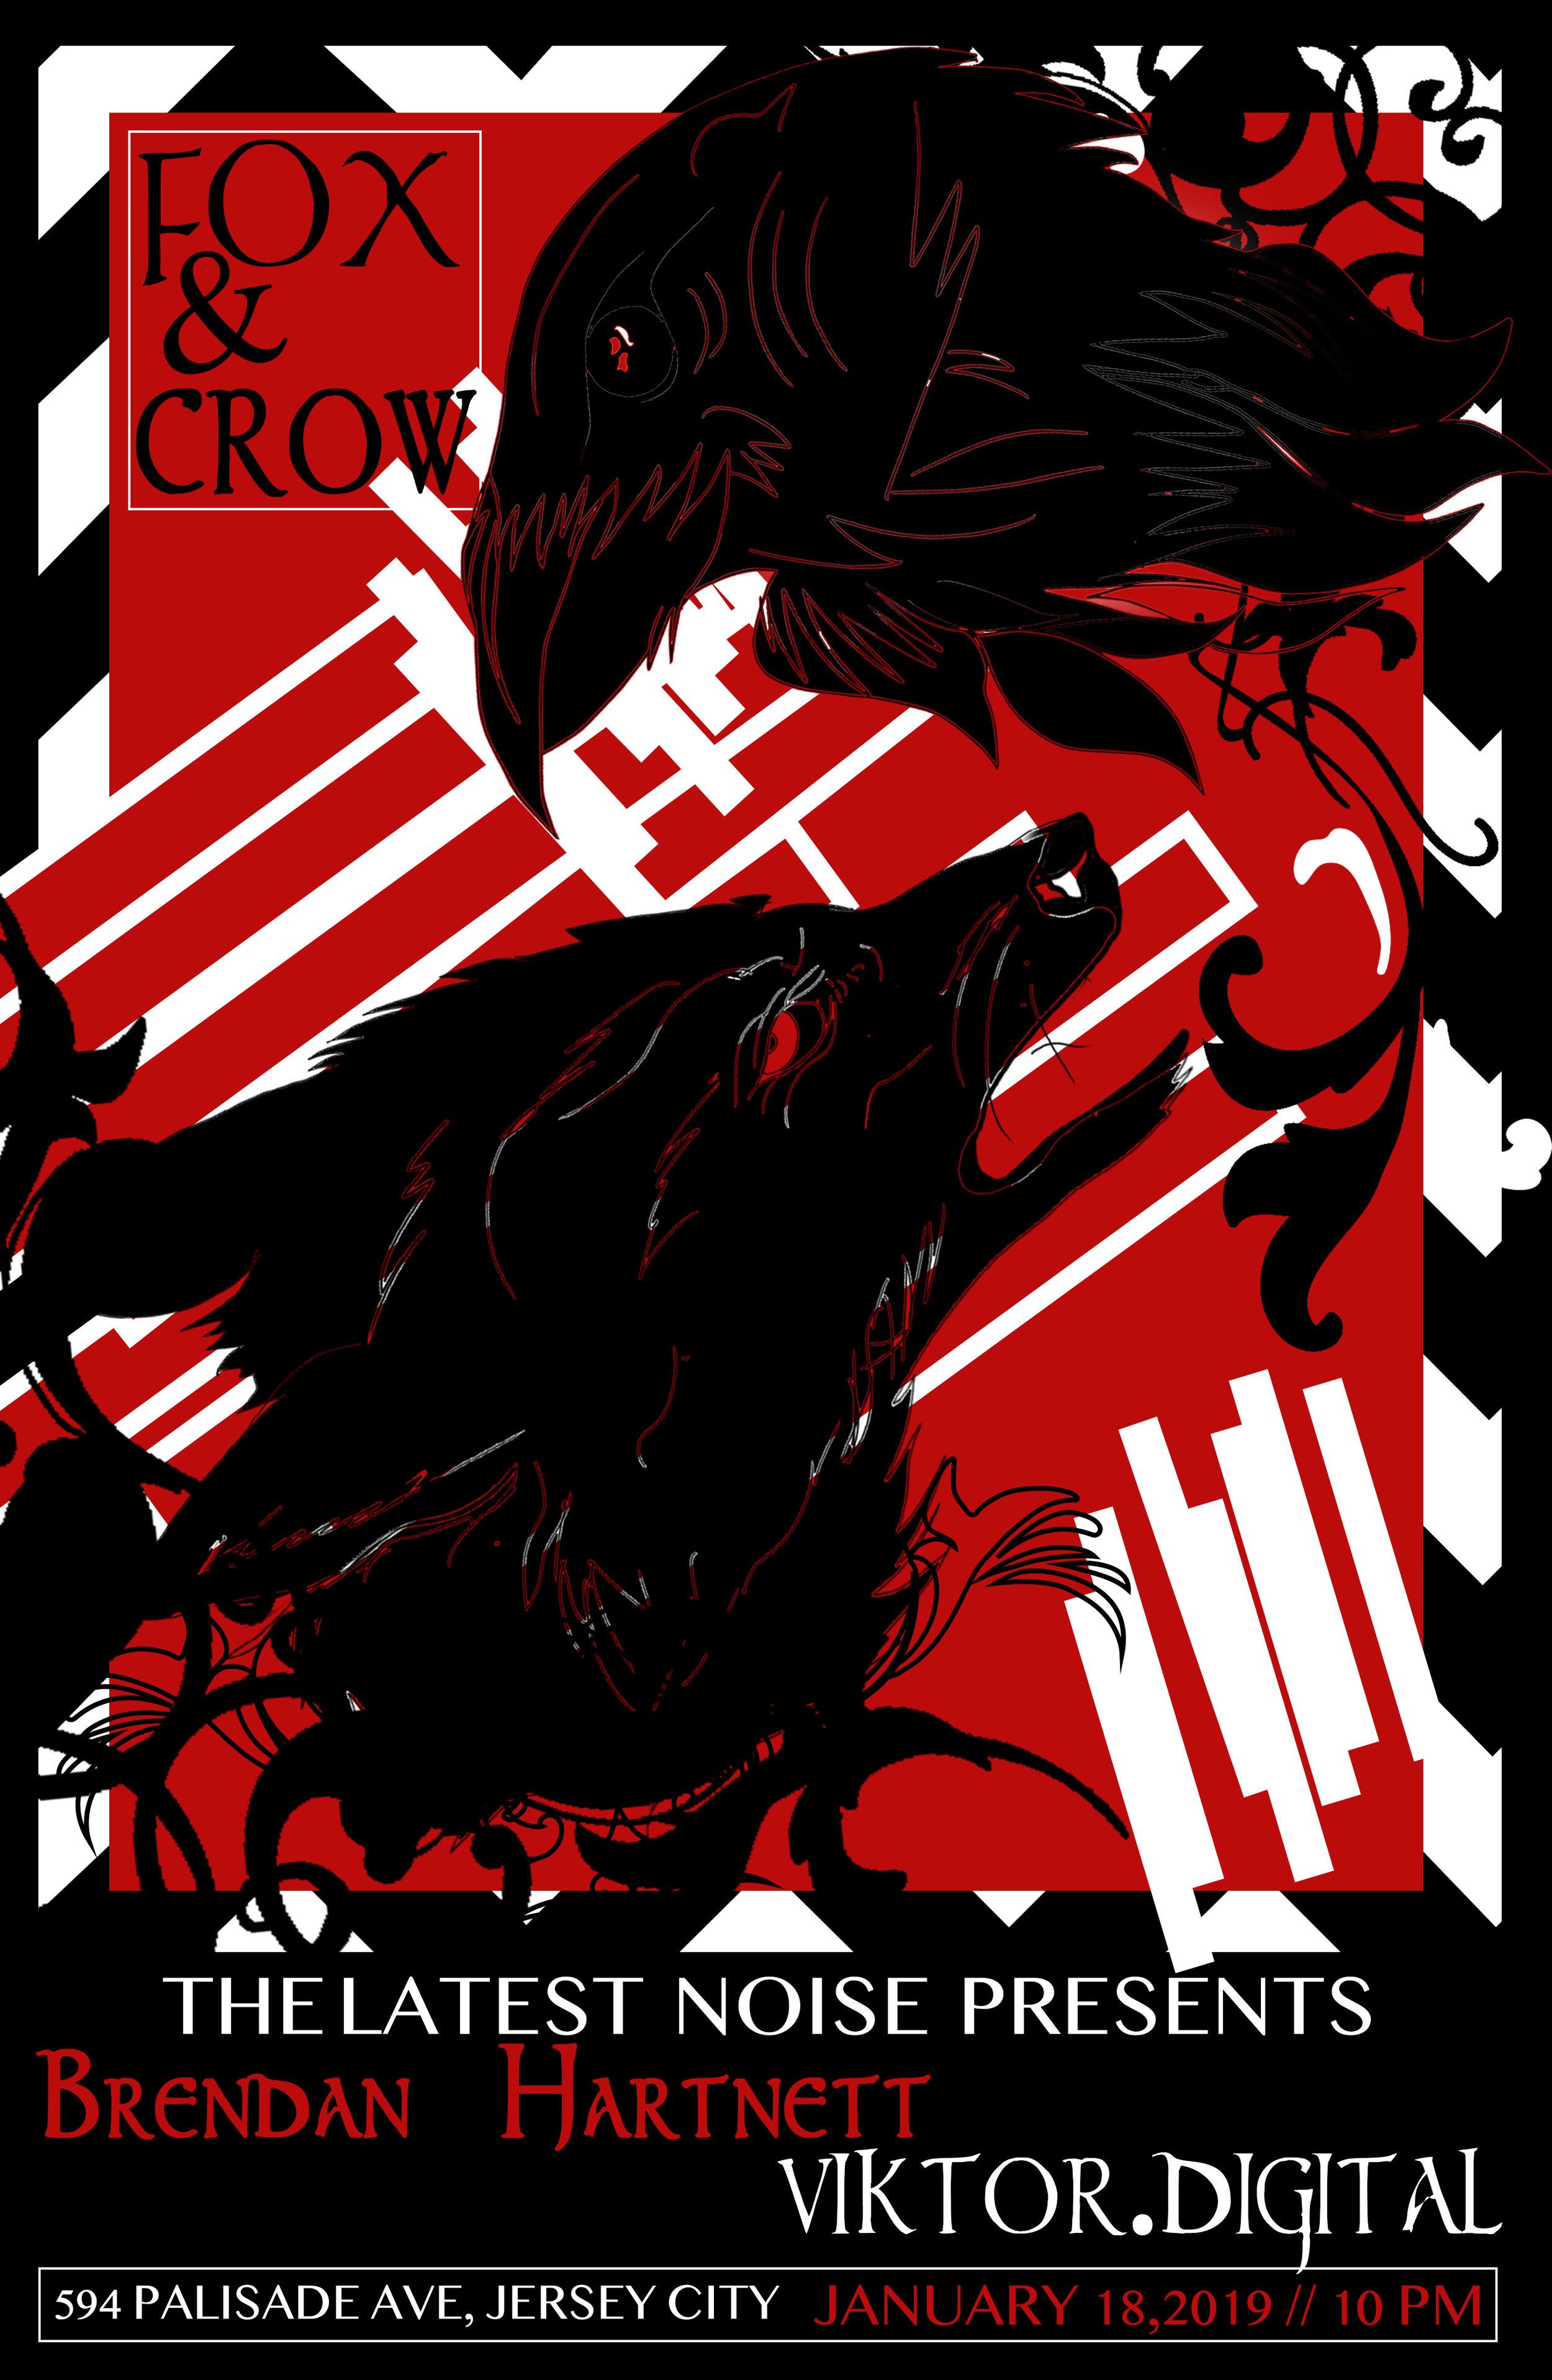 Fox and Crow 1-18-19-JPG.jpg